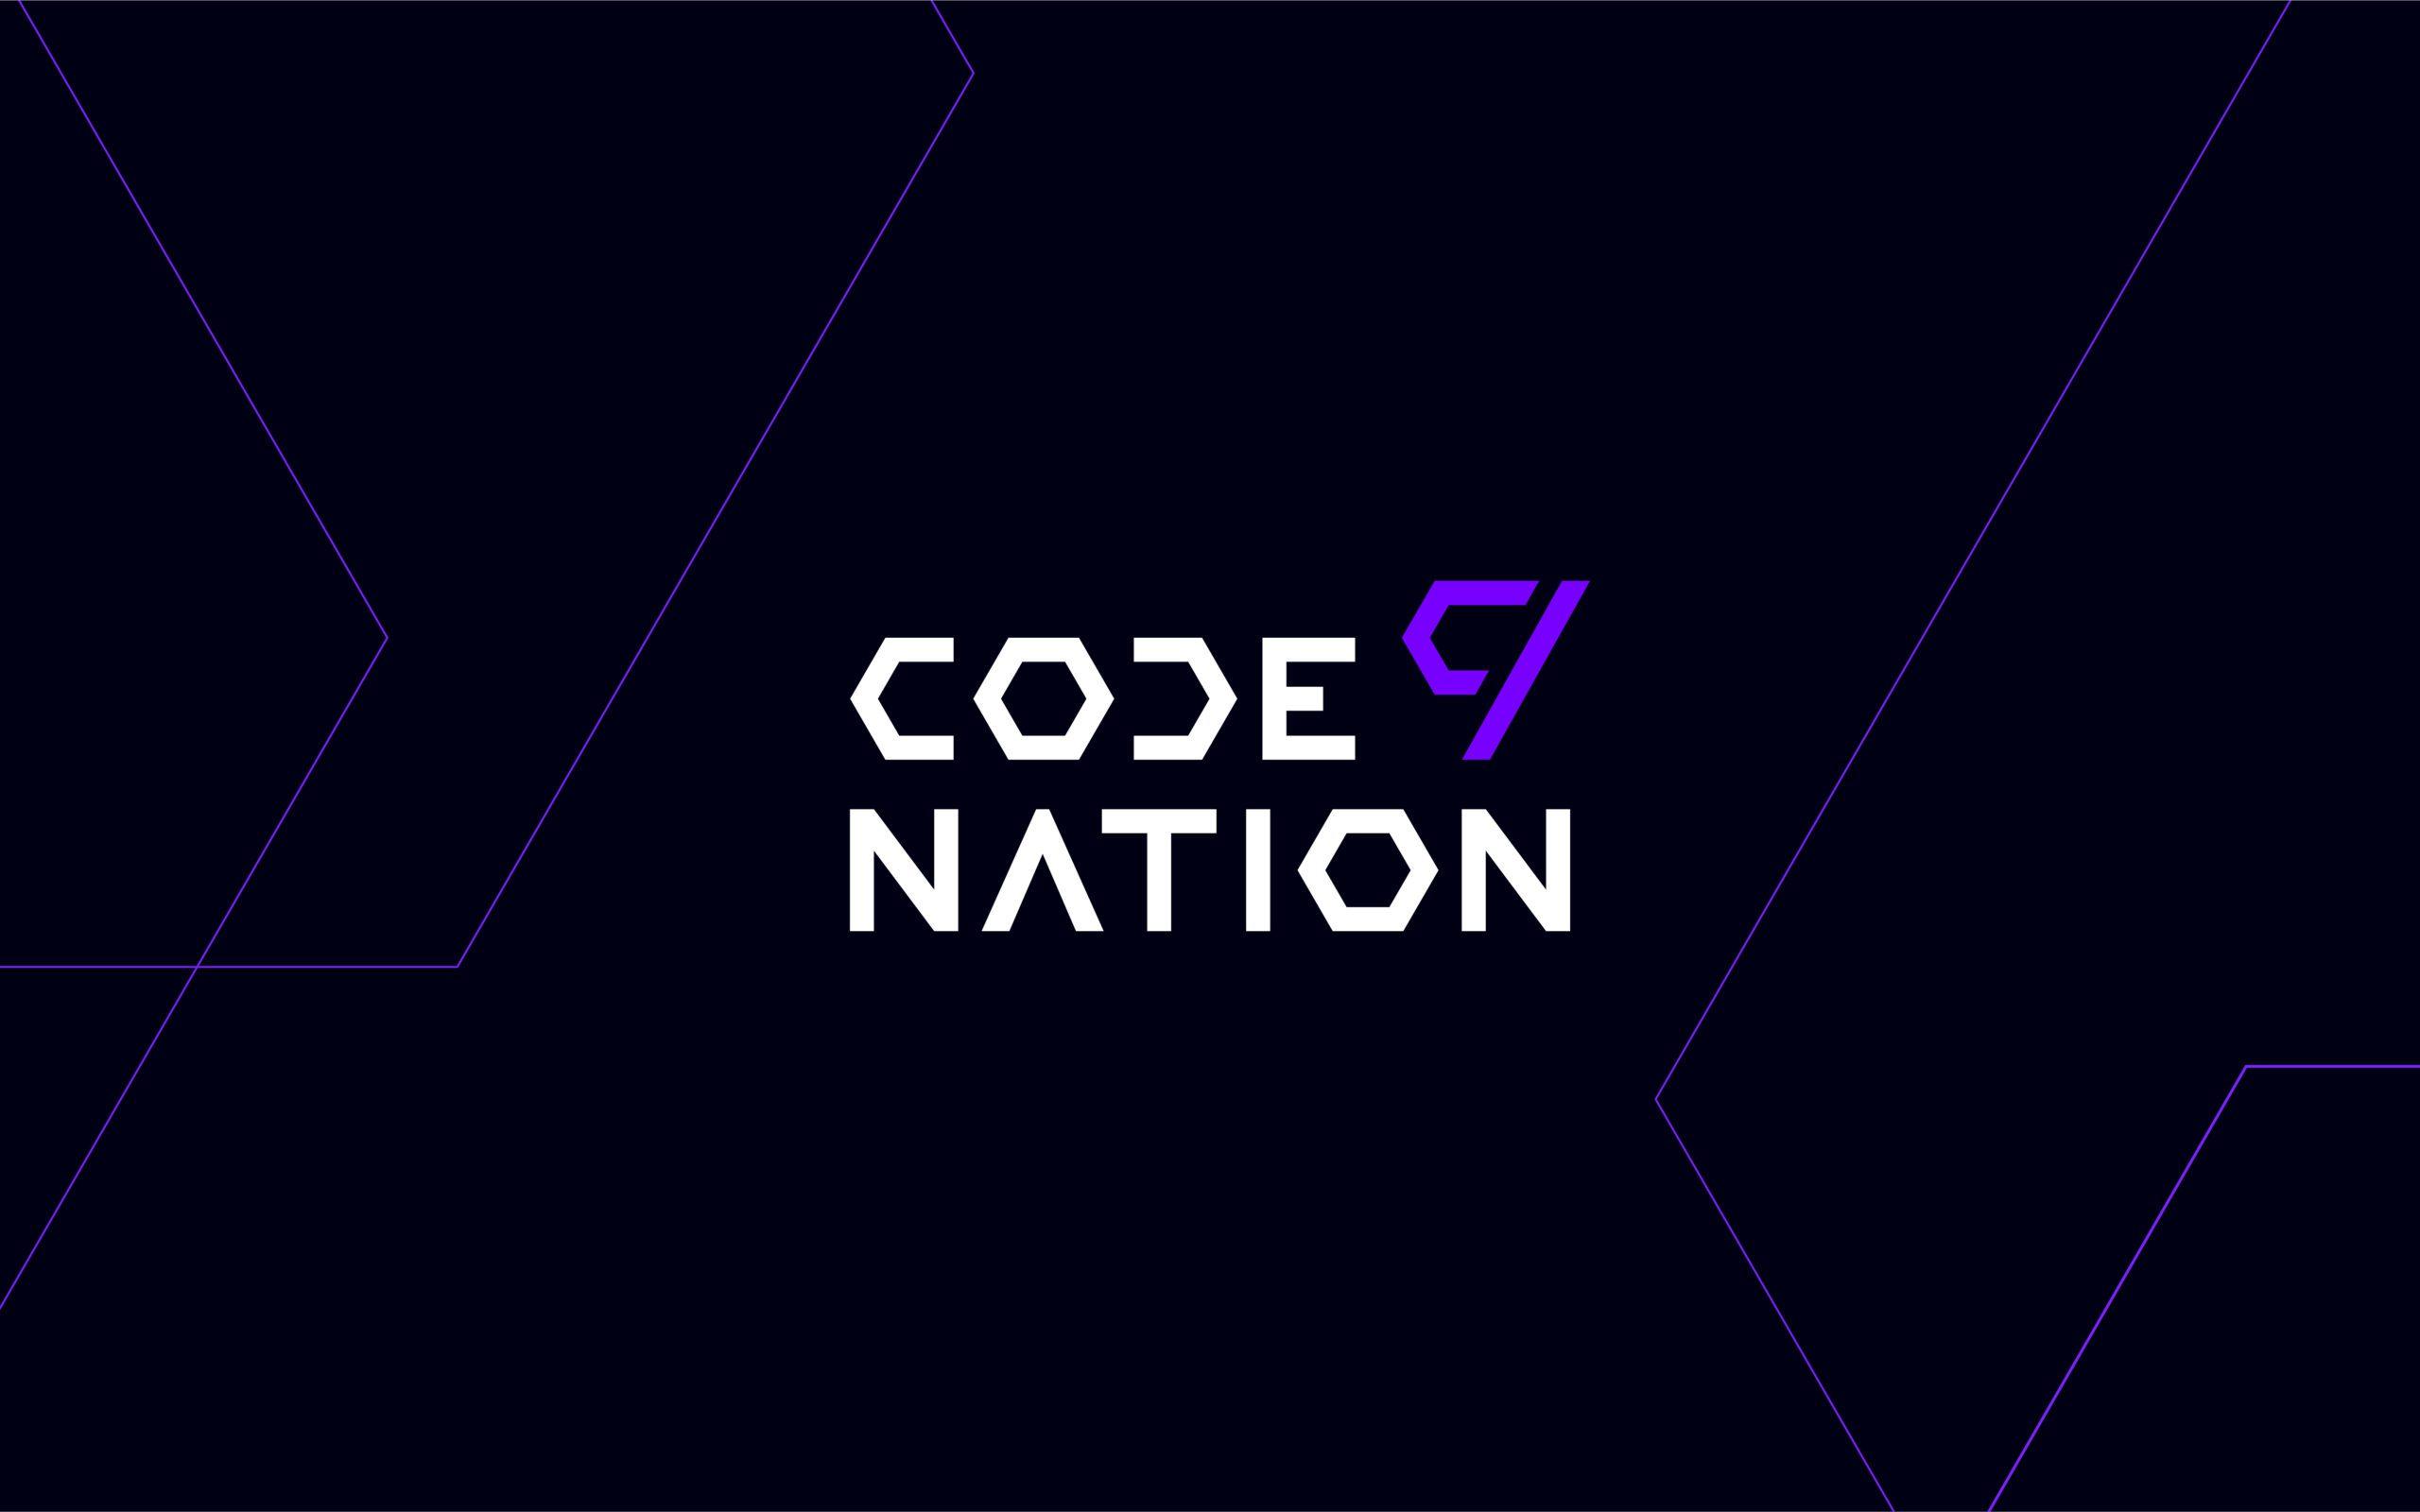 codenation-branding-design-brand-startup-39